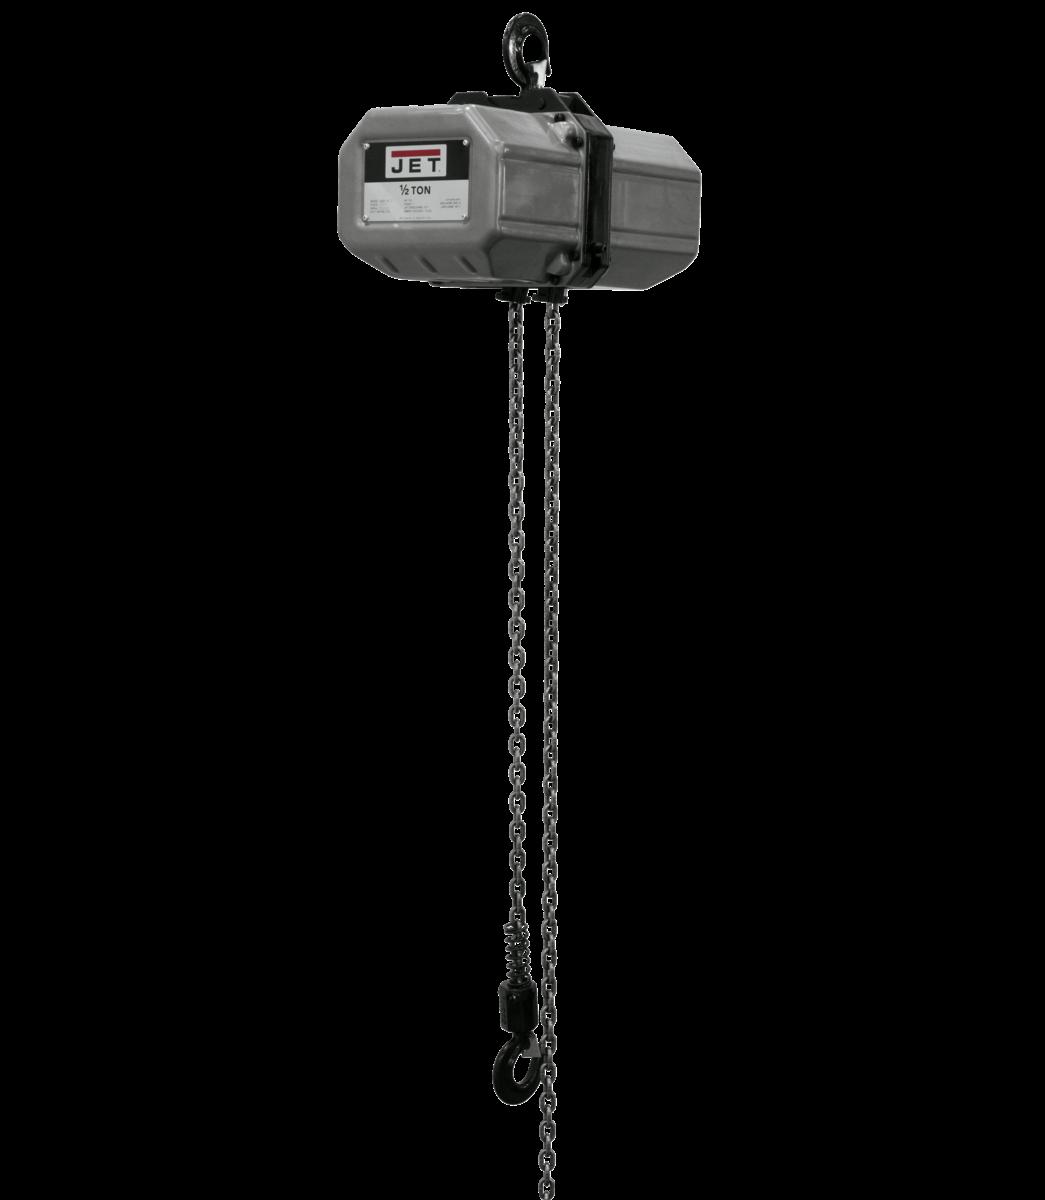 1/2SS-3C-10, 1/2-Ton Electric Chain Hoist 3-Phase 10' Lift